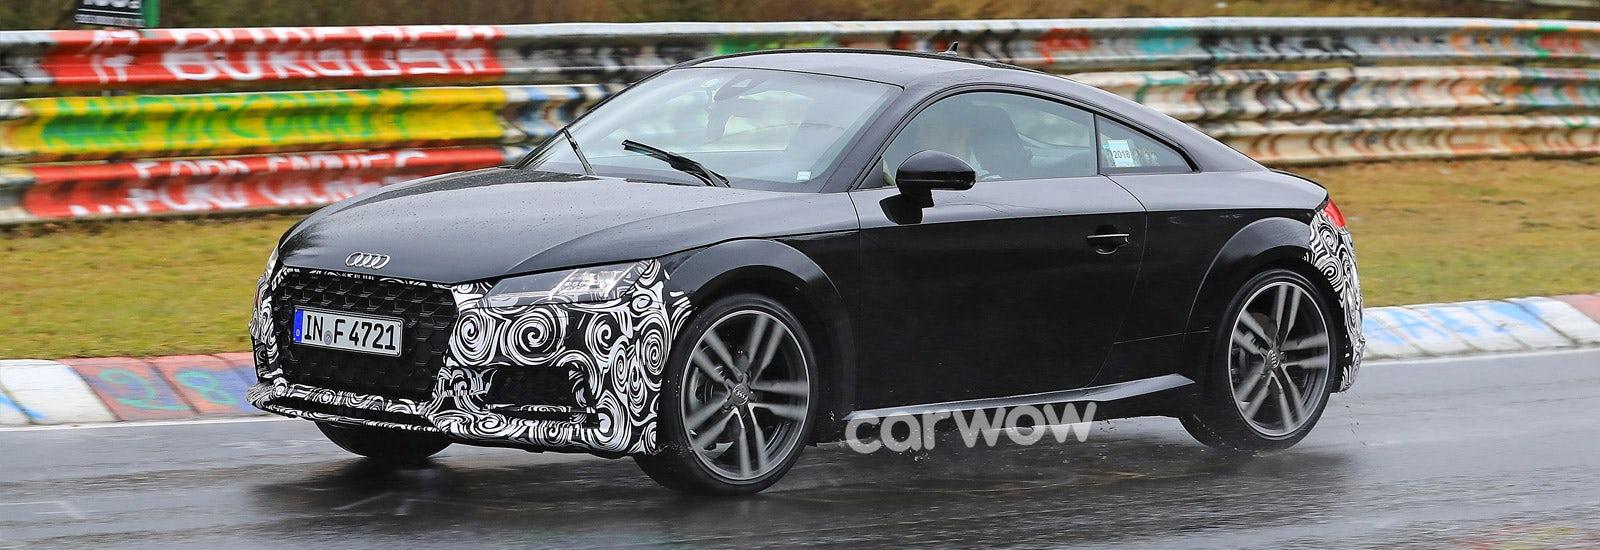 Audi TT Facelift Price Specs Release Date Carwow - Audi tt price